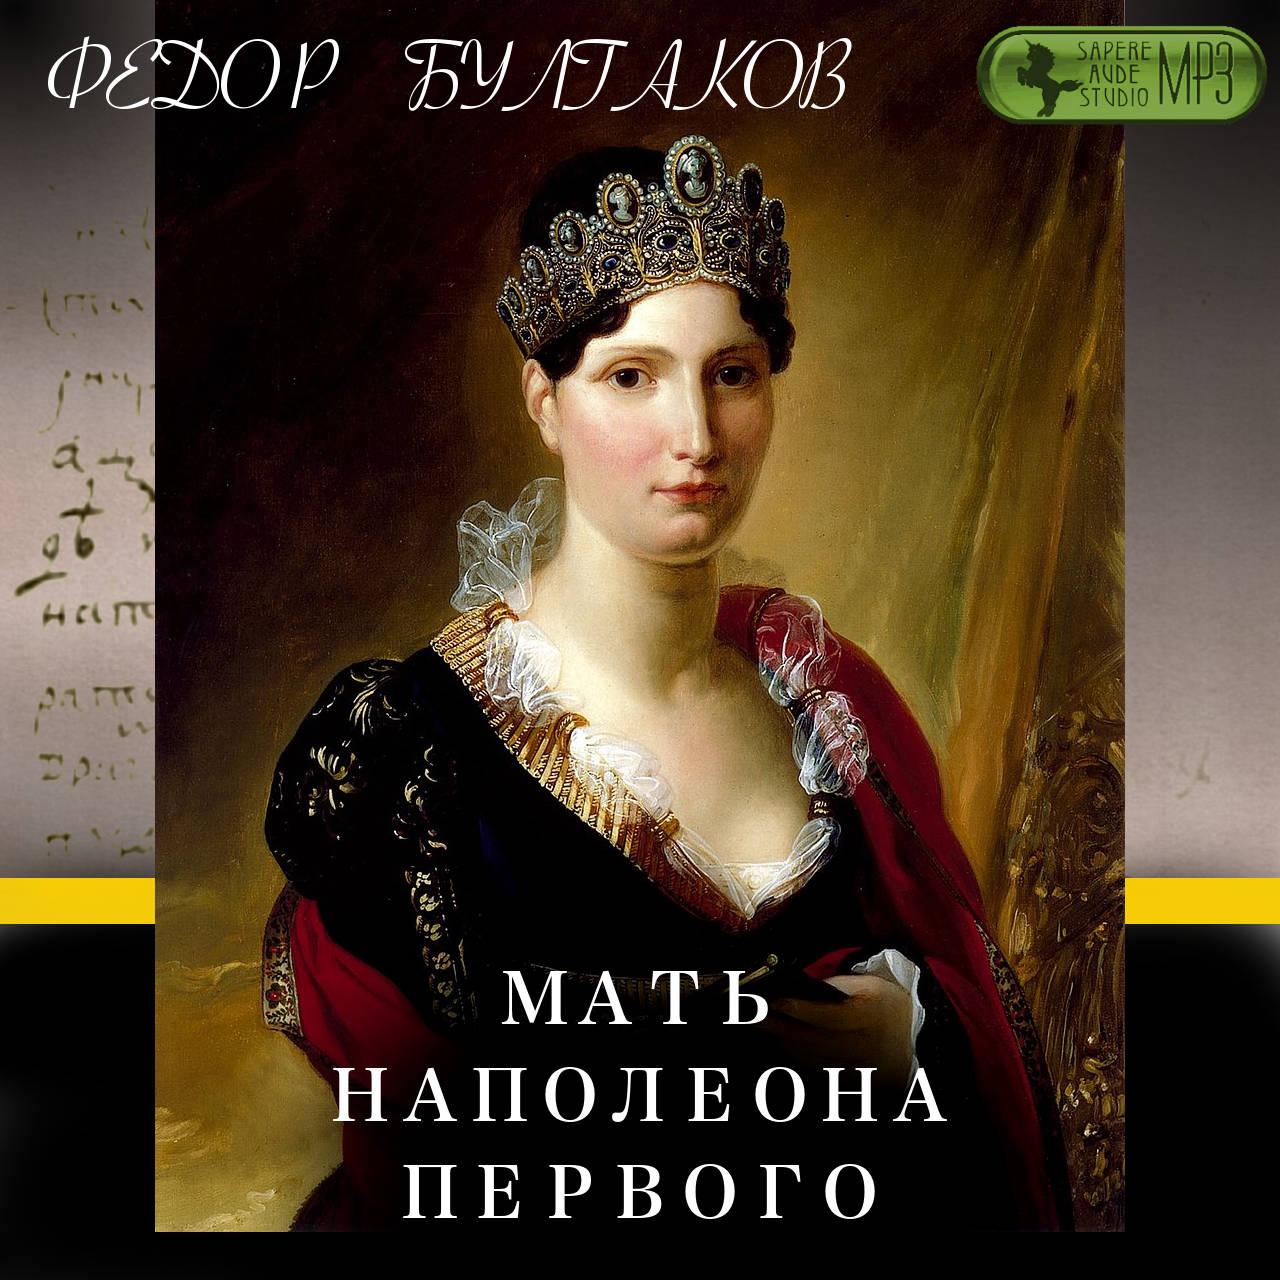 цена Федор Булгаков Мать НаполеонаI онлайн в 2017 году